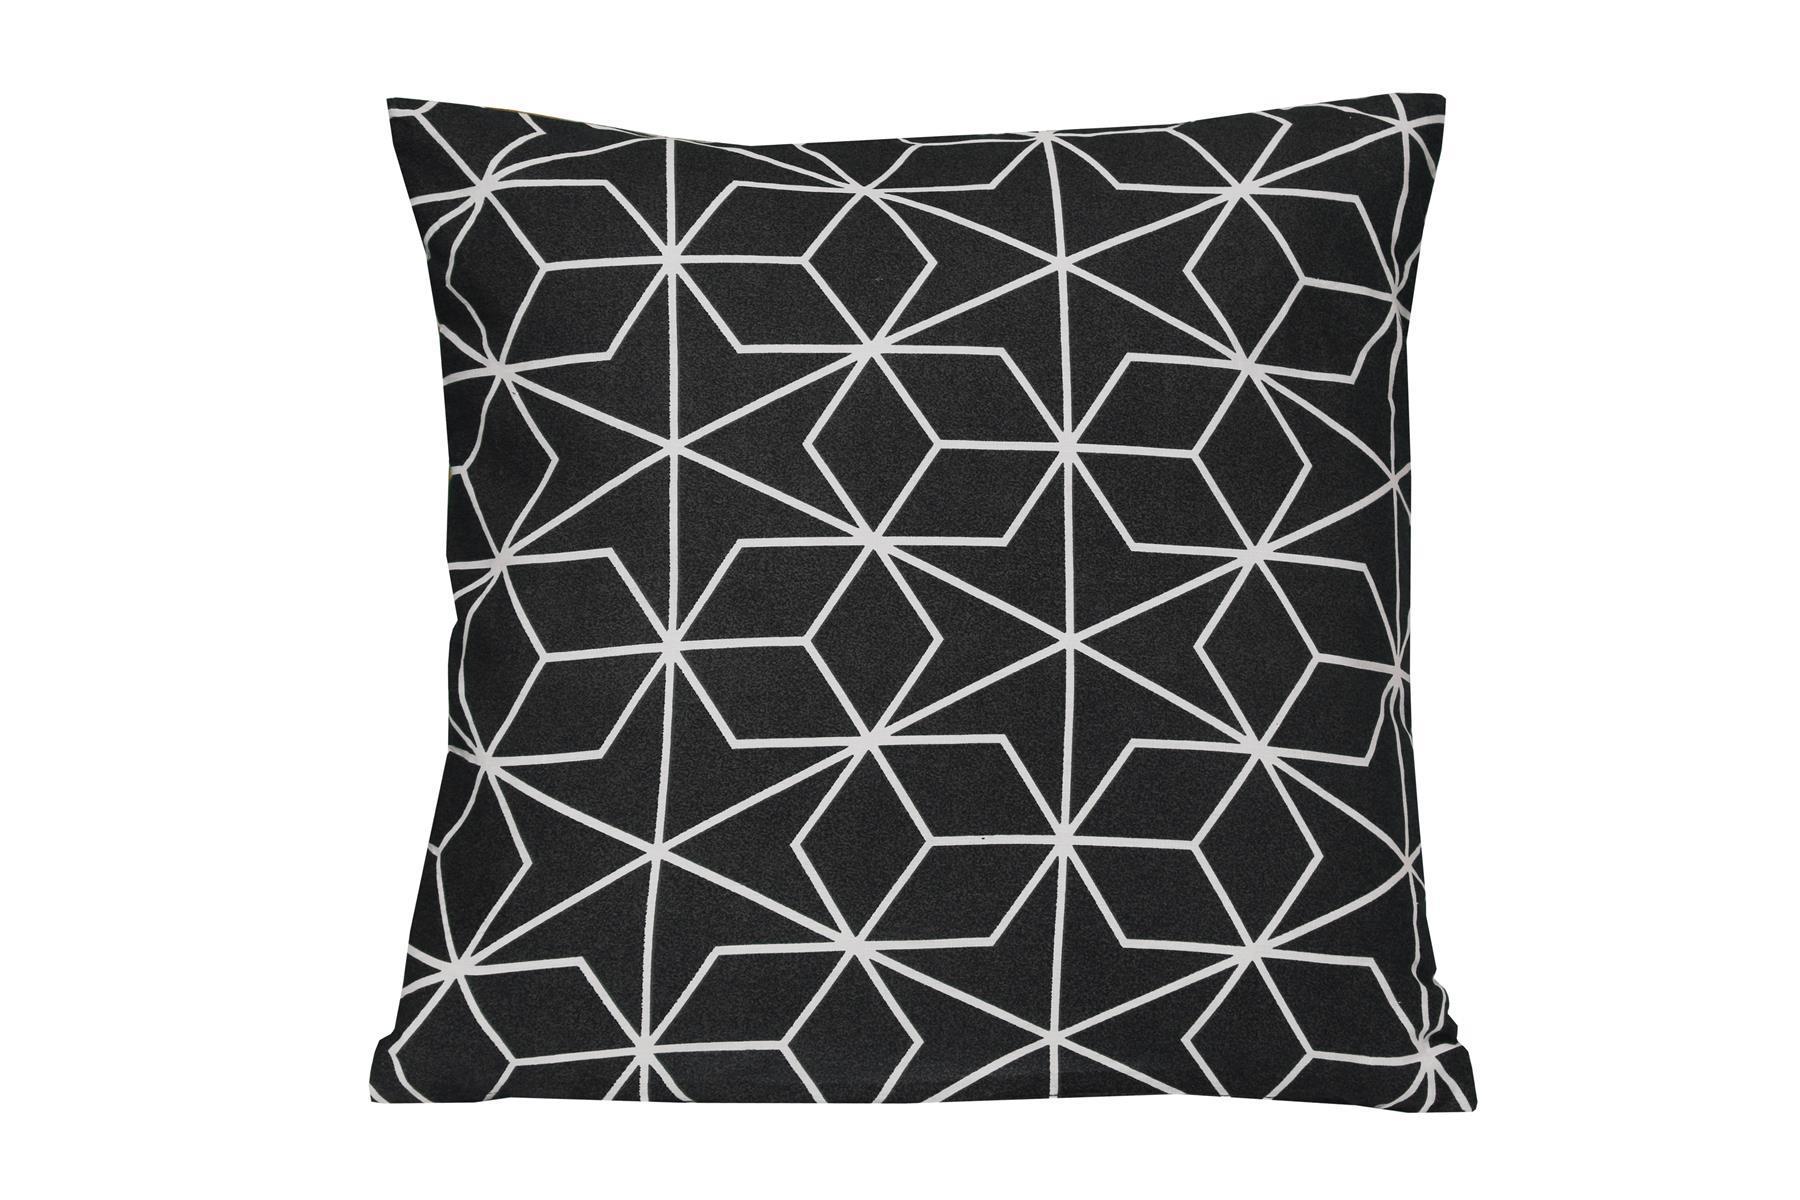 Conjunto-de-Edredon-Geometrico-100-algodon-acolchado-Suave-Ropa-De-Cama-Simple-Doble-King-Size miniatura 39